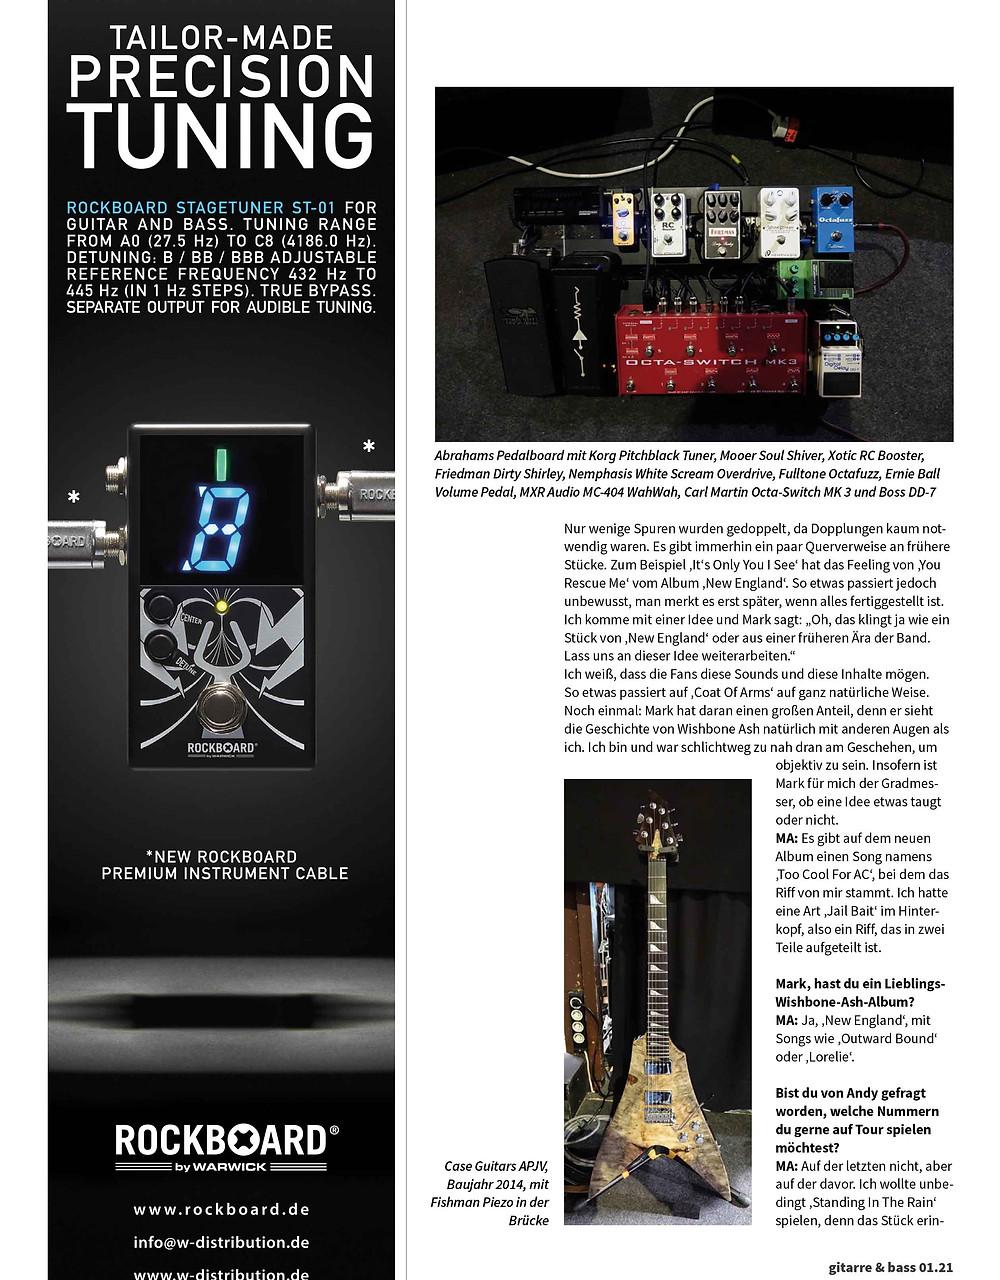 mark abrahams wishbone ash interview gitarre and bass magazine germany, tokai guitars and pedalboard